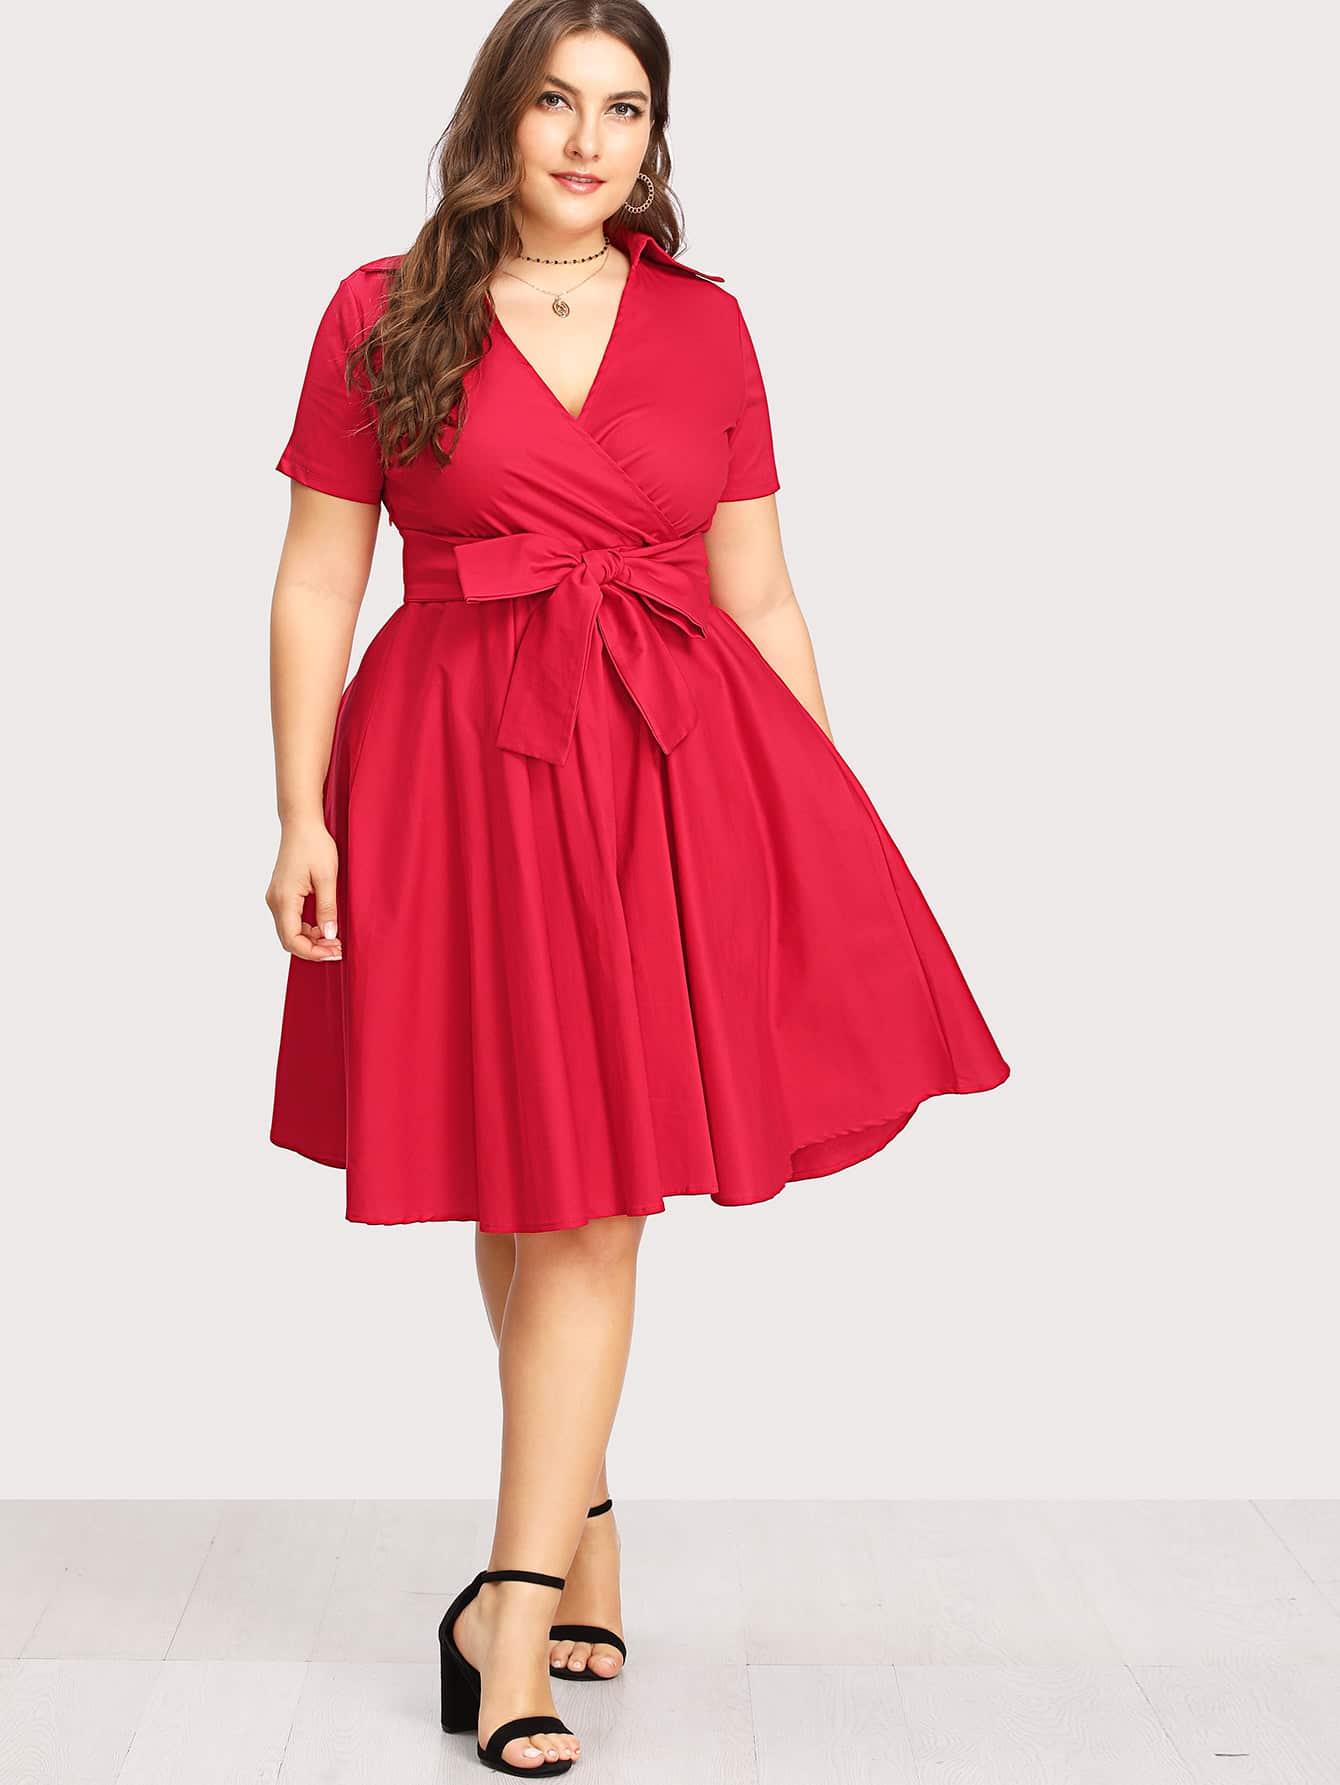 Surplice Neckline Self Tie Circle Dress